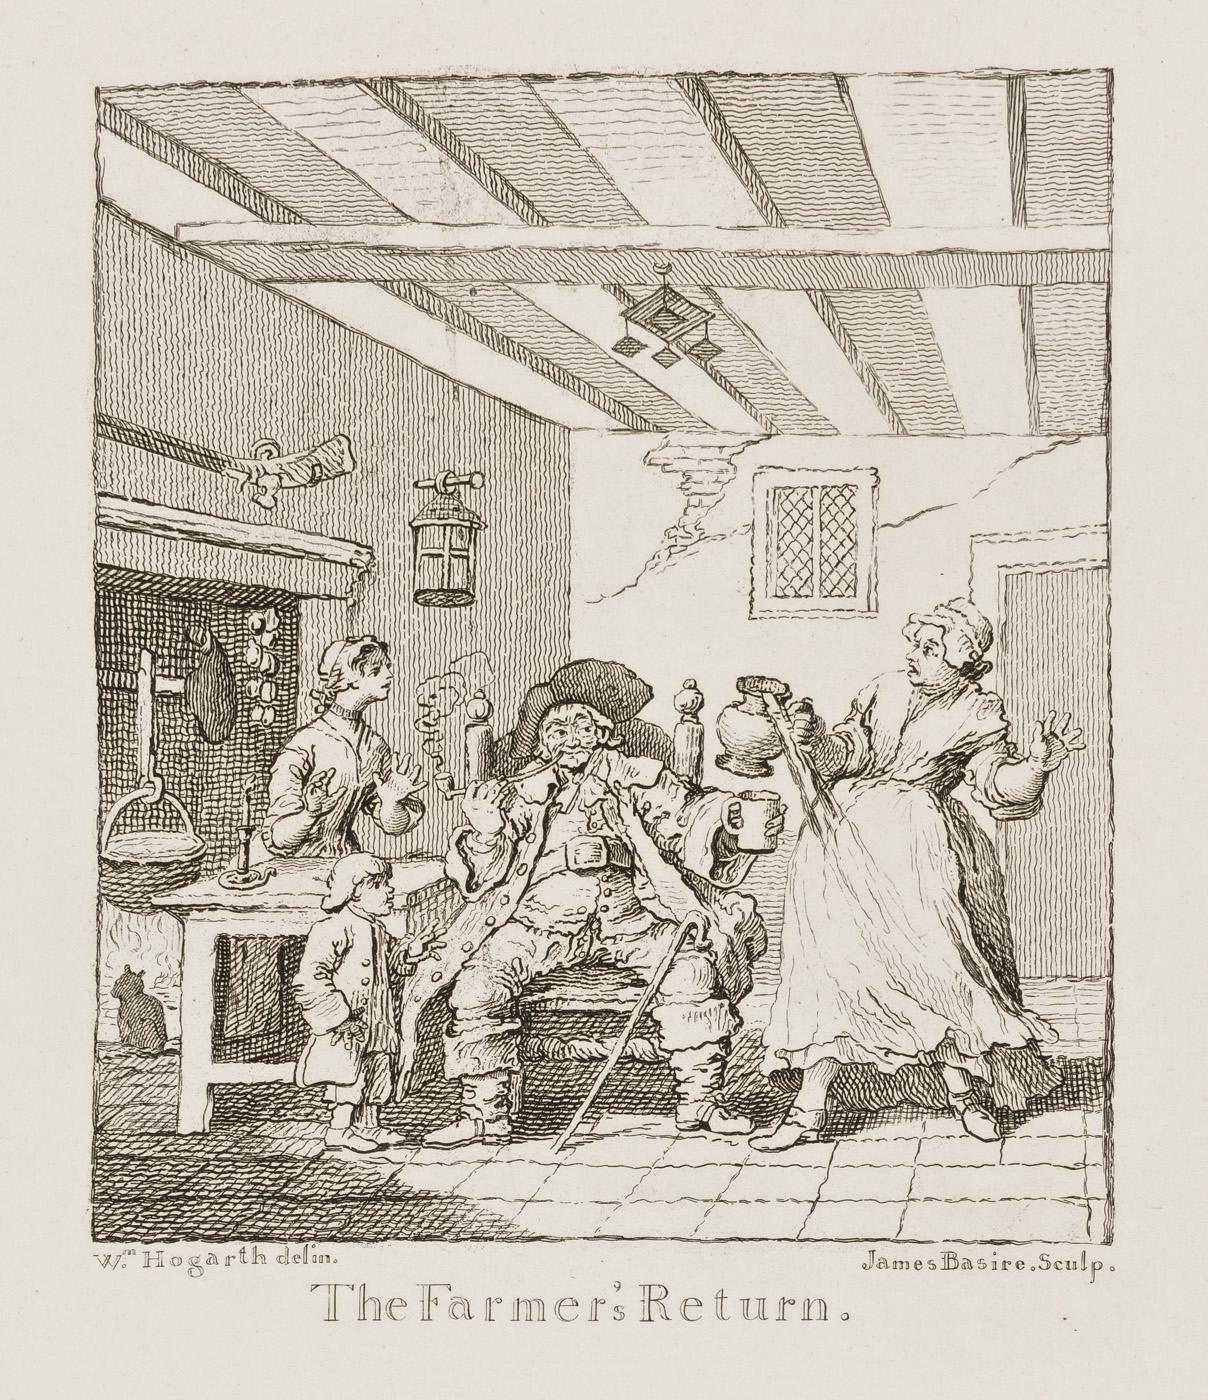 William Hogarth - The Farmer's Return